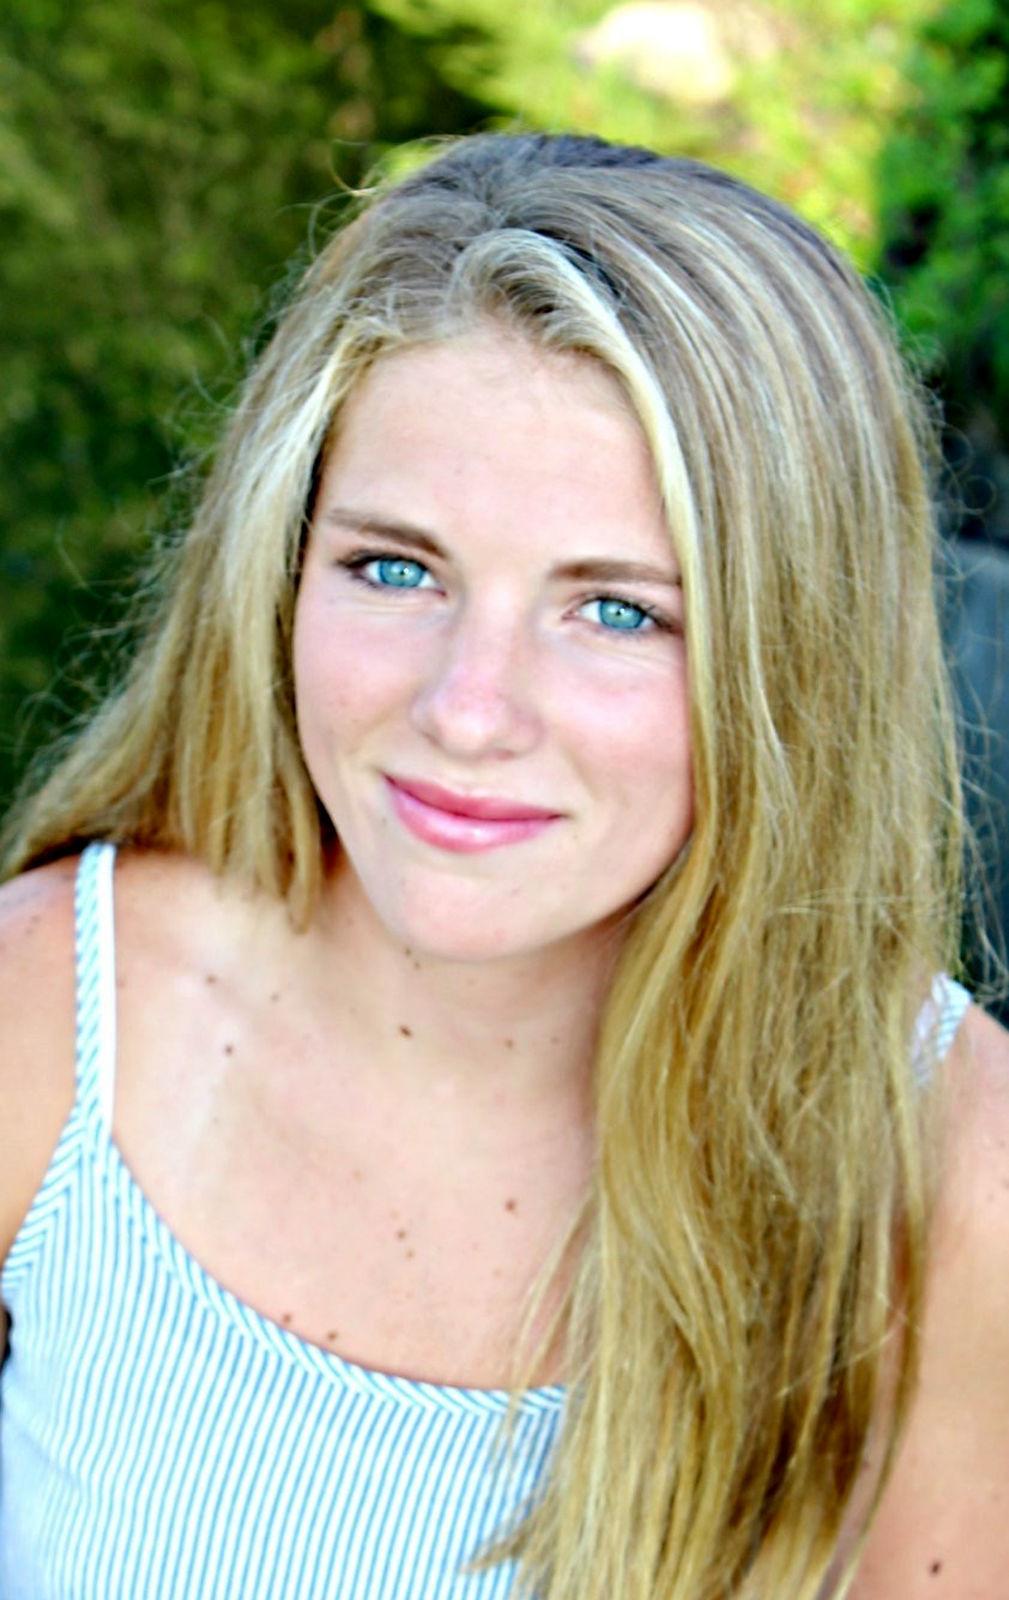 Taylor Hogan